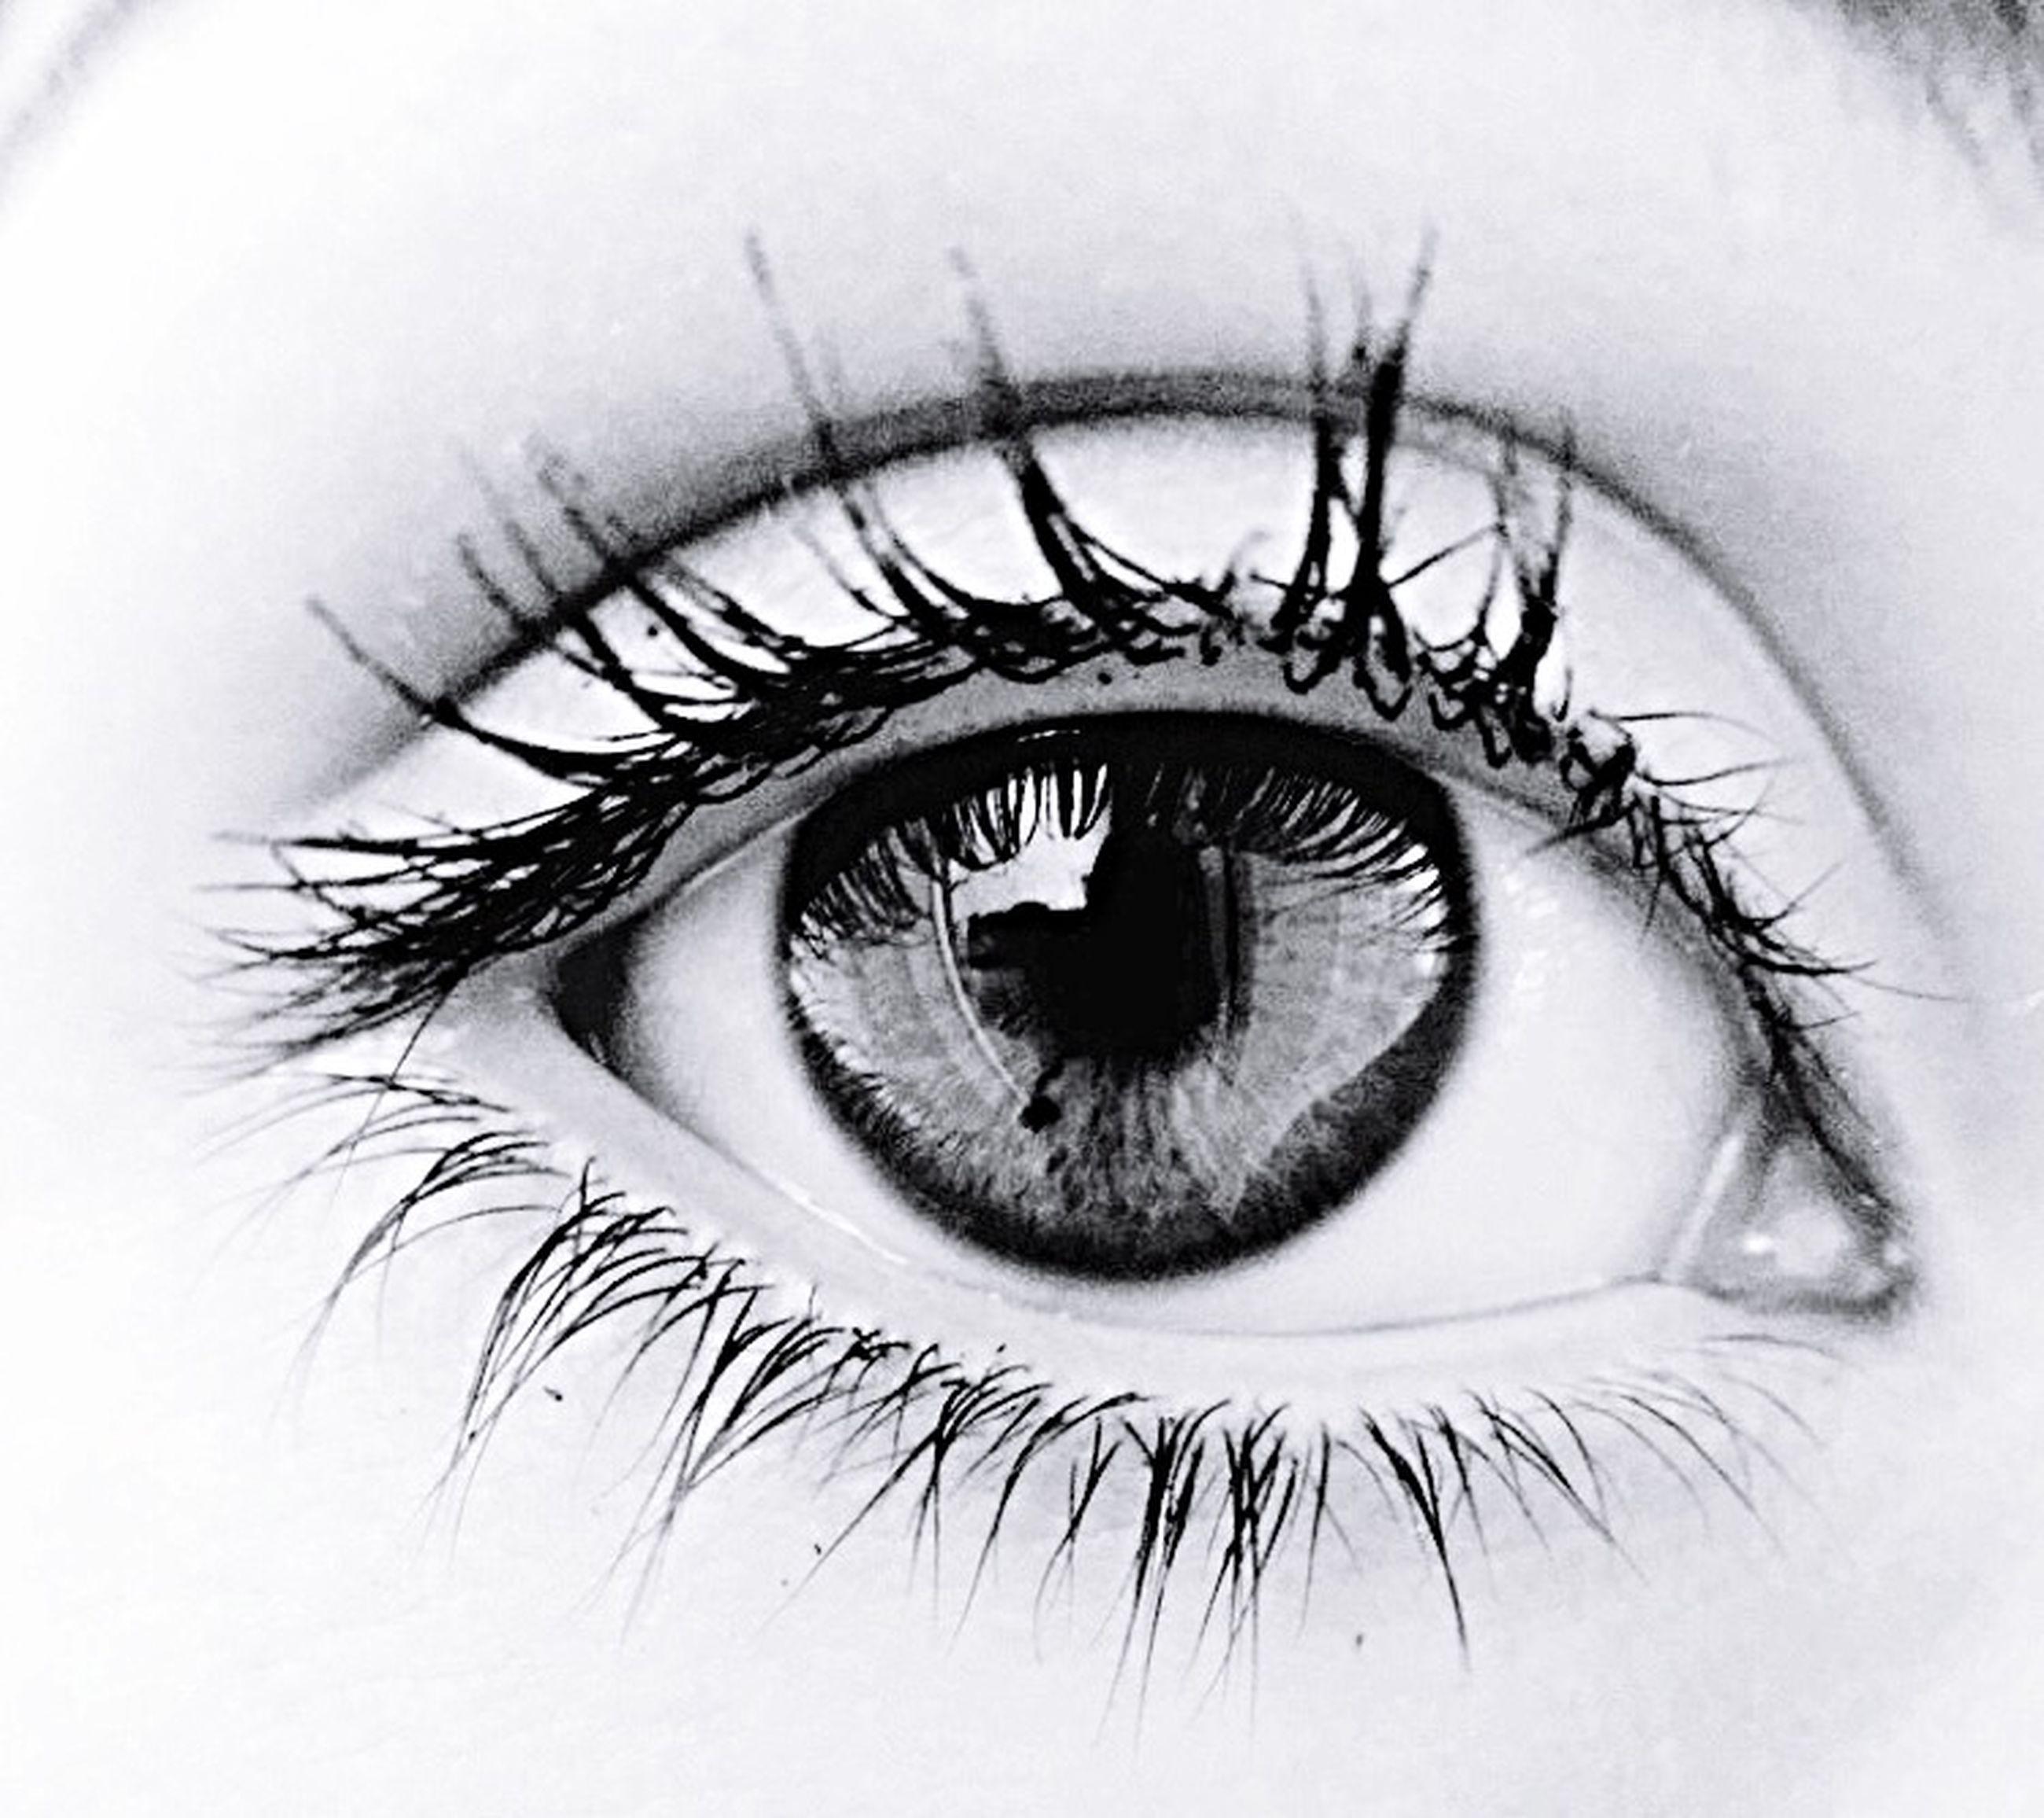 human eye, eyelash, eyesight, close-up, looking at camera, sensory perception, portrait, eyeball, iris - eye, extreme close-up, part of, vision, indoors, circle, lifestyles, human face, human skin